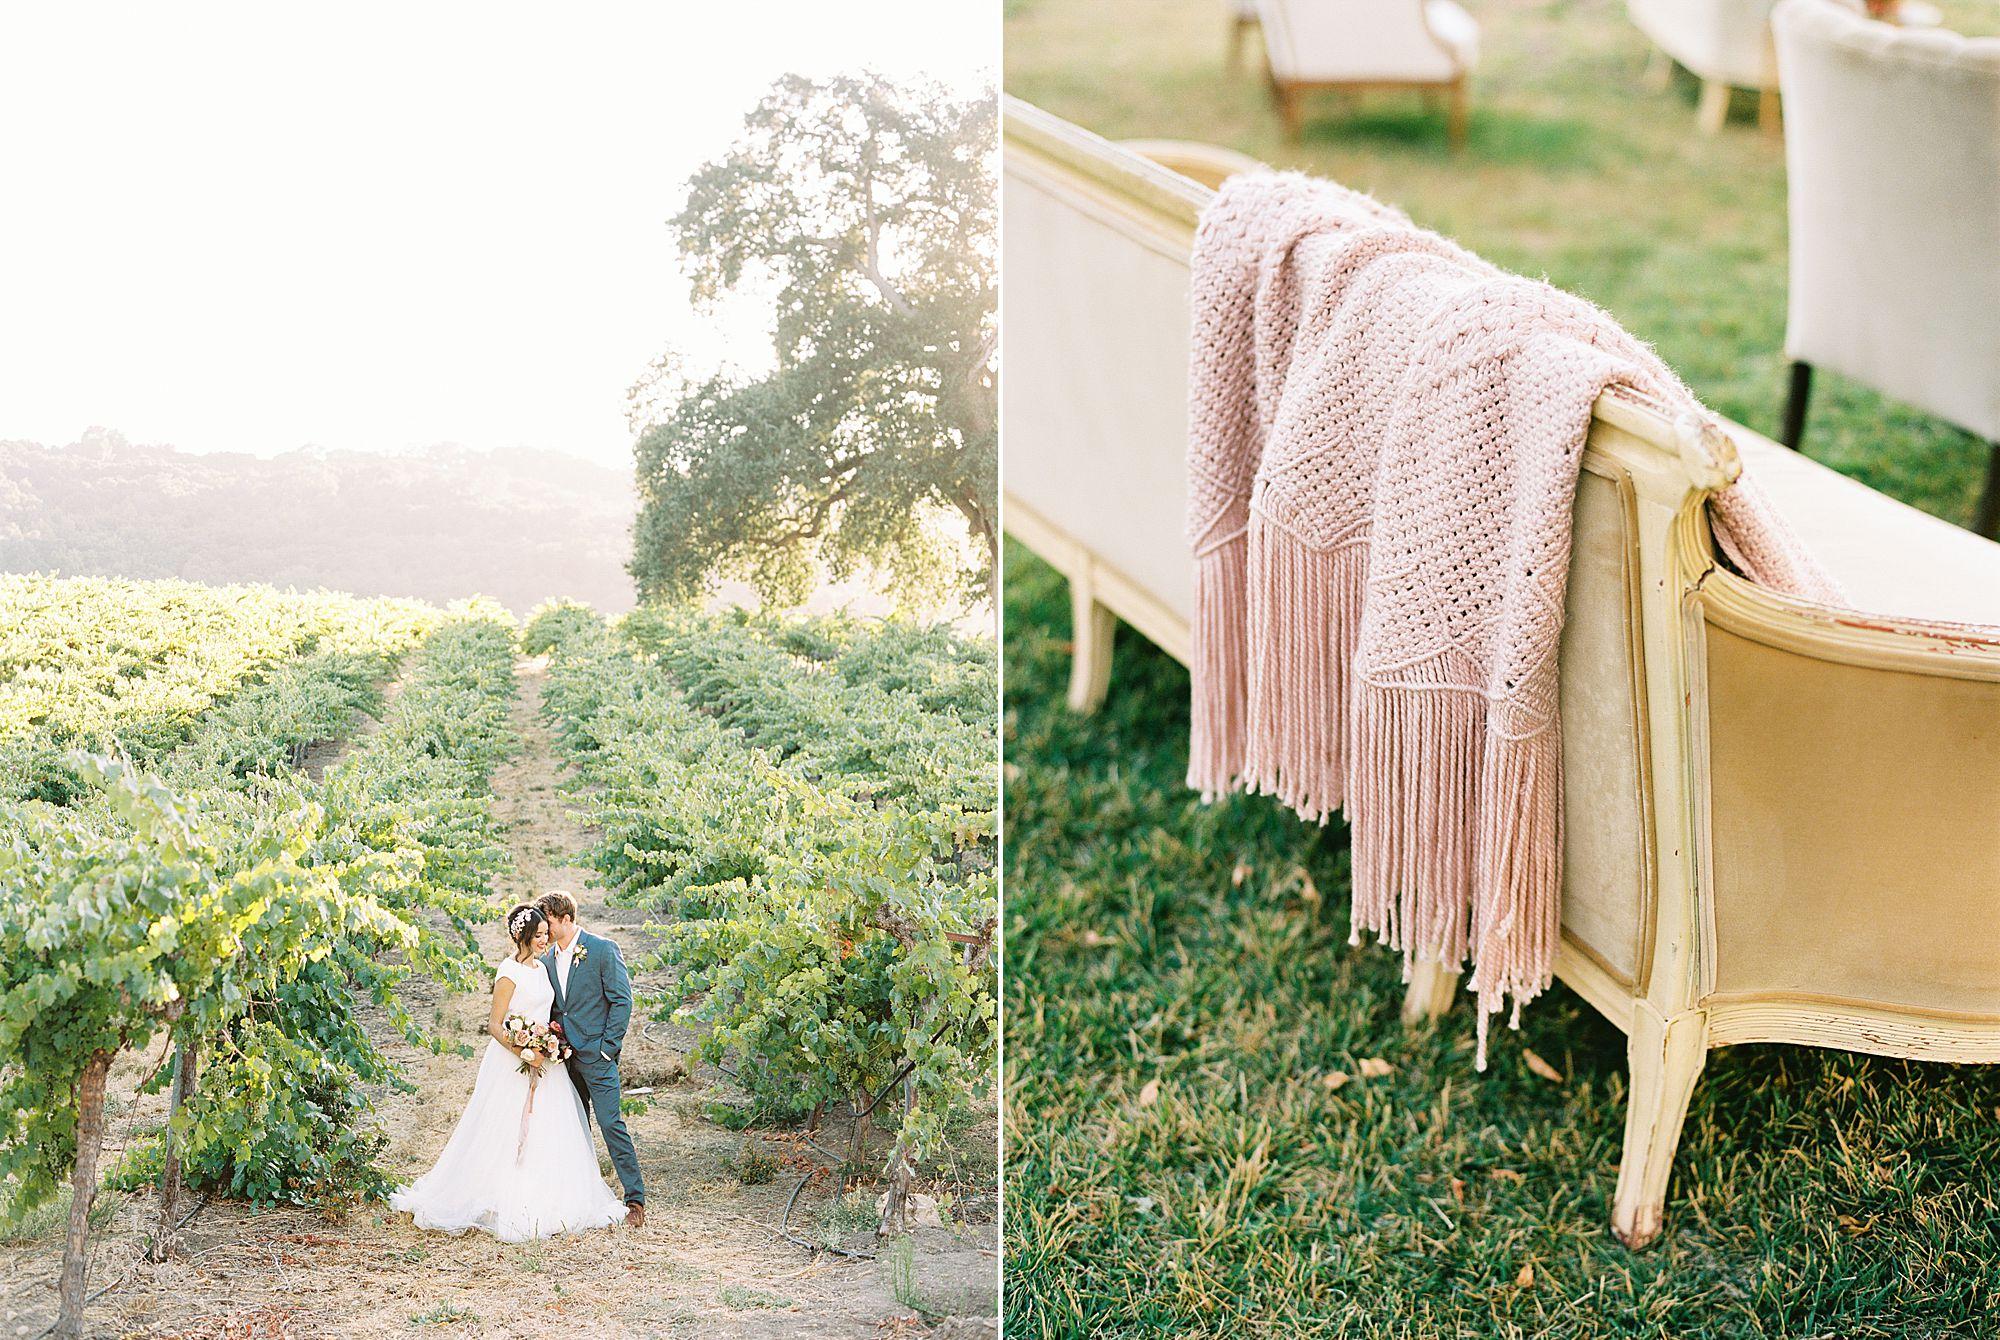 HammerSky Wedding Inspiration Featured on Hey Wedding Lady with Vanessa Noel Events - Ashley Baumgartner - SLO Wedding Photographer_0009.jpg